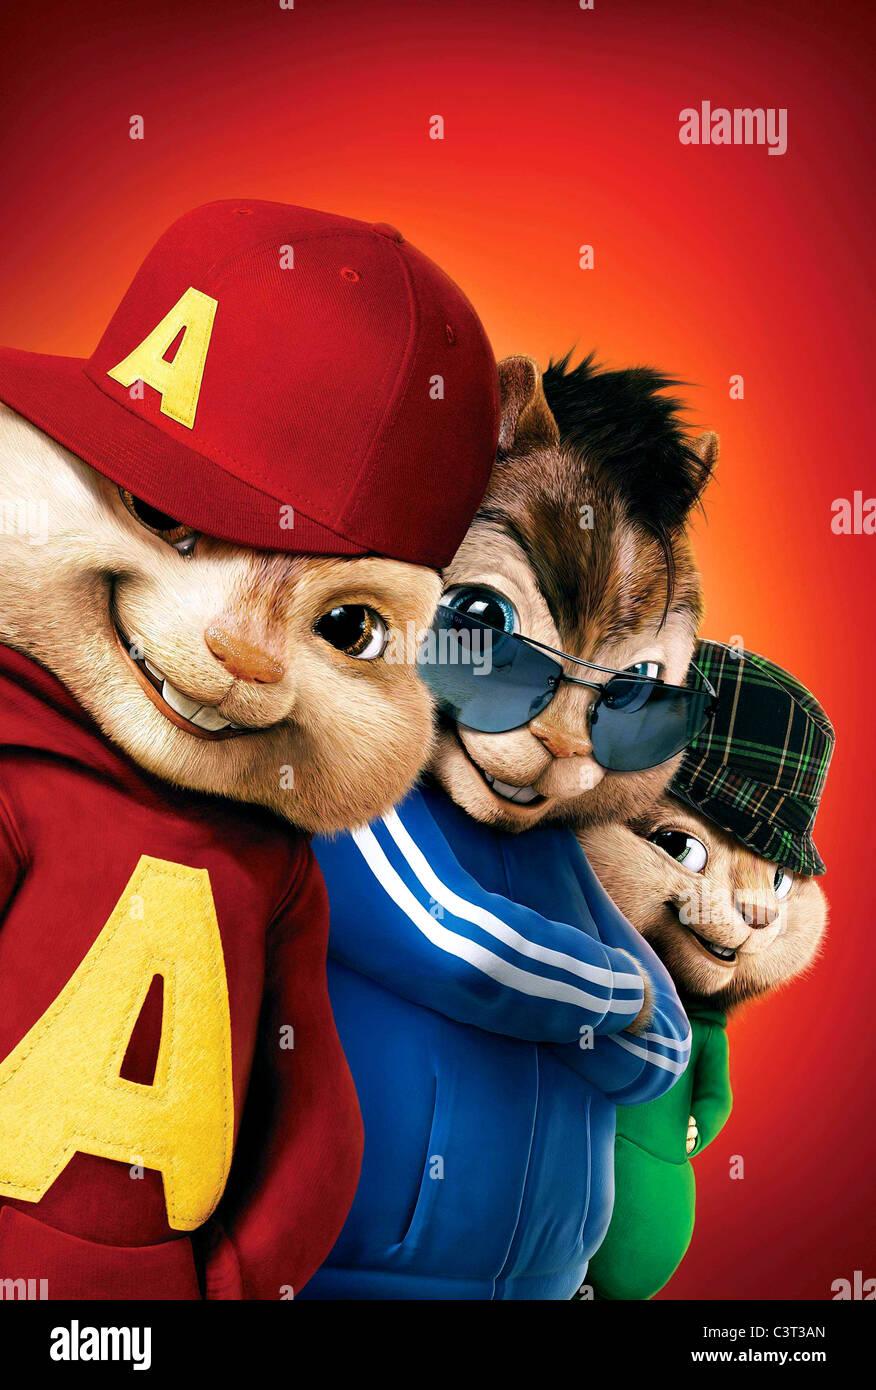 alvin simon theodore alvin and the chipmunks the squeakquel 2009